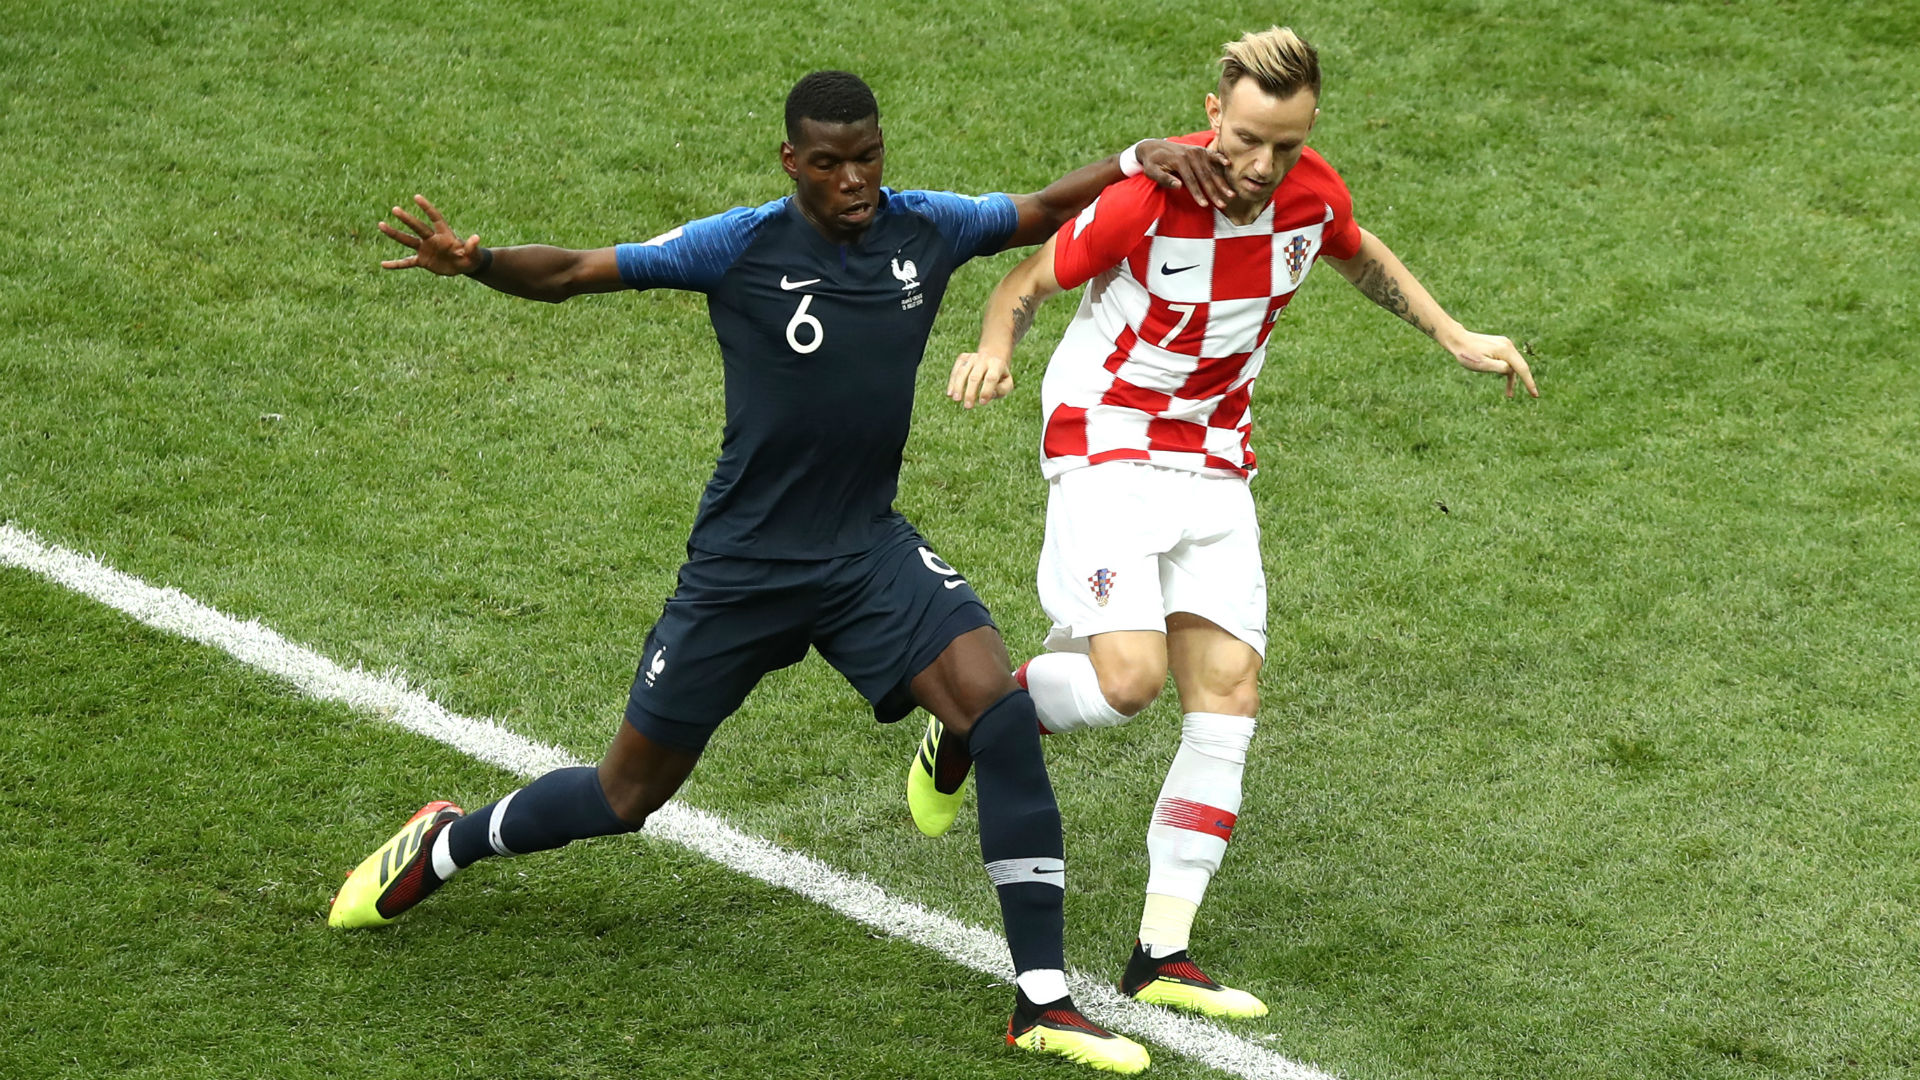 Paul Pogba Ivan Rakitic Croatia France World Cup final 2018